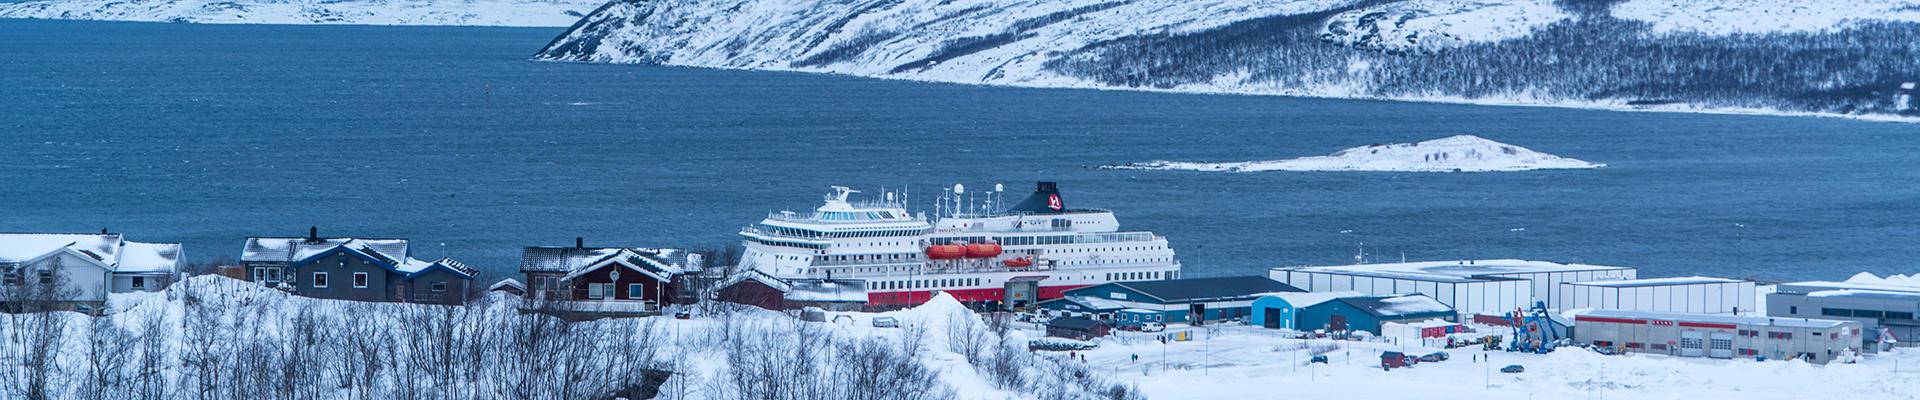 FO Finnmark